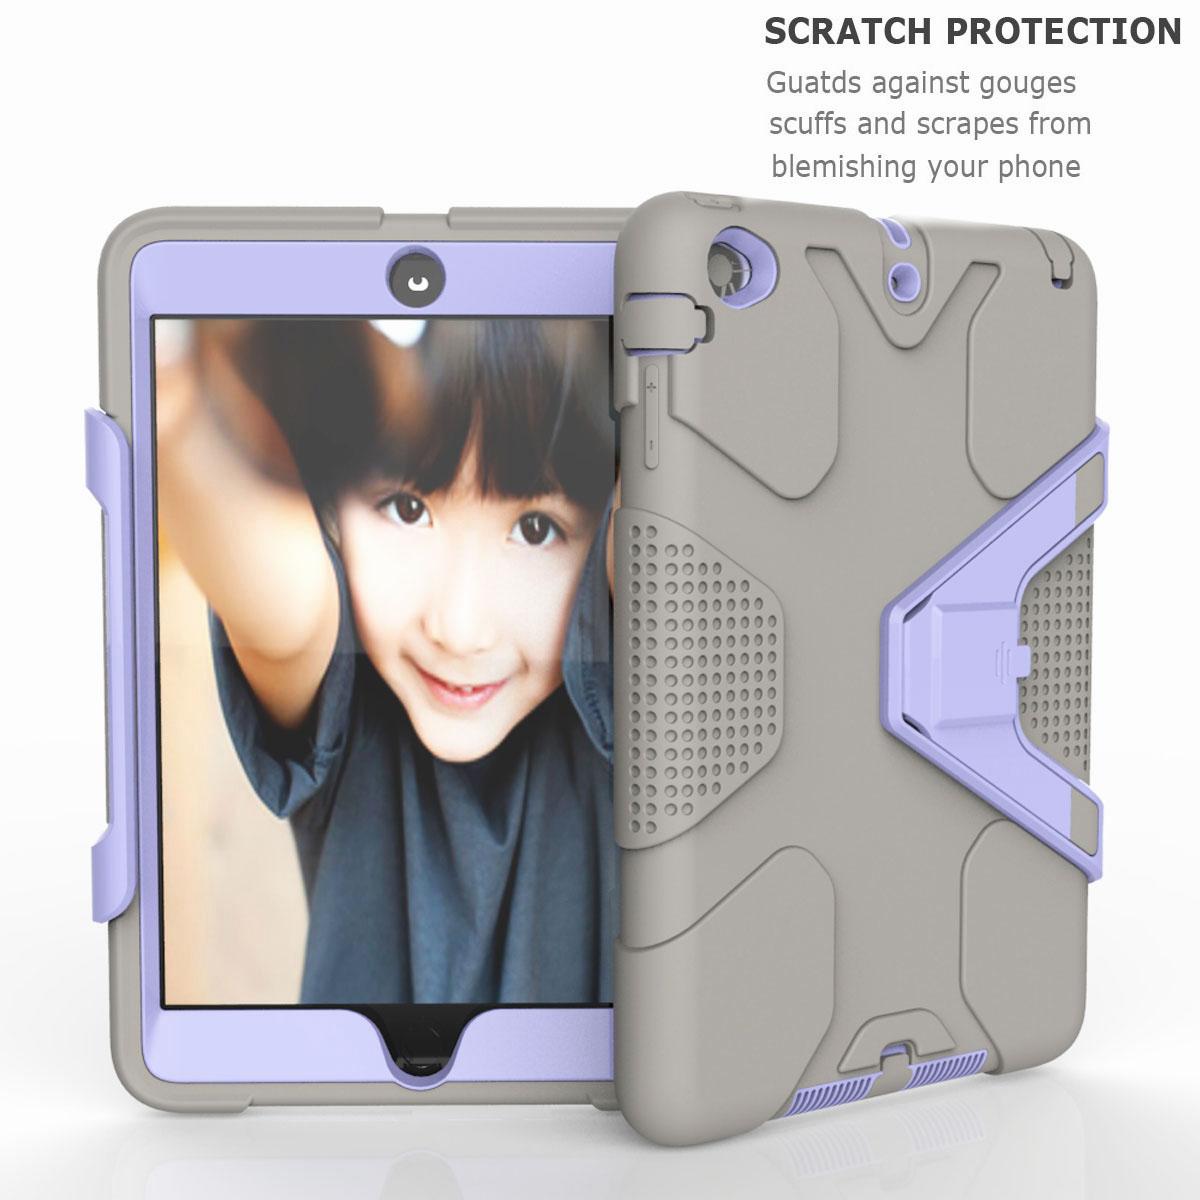 Luxury-Shockproof-Tough-Armor-with-Hard-Kickstand-Case-For-Apple-iPad-Mini-1-2-3 thumbnail 34